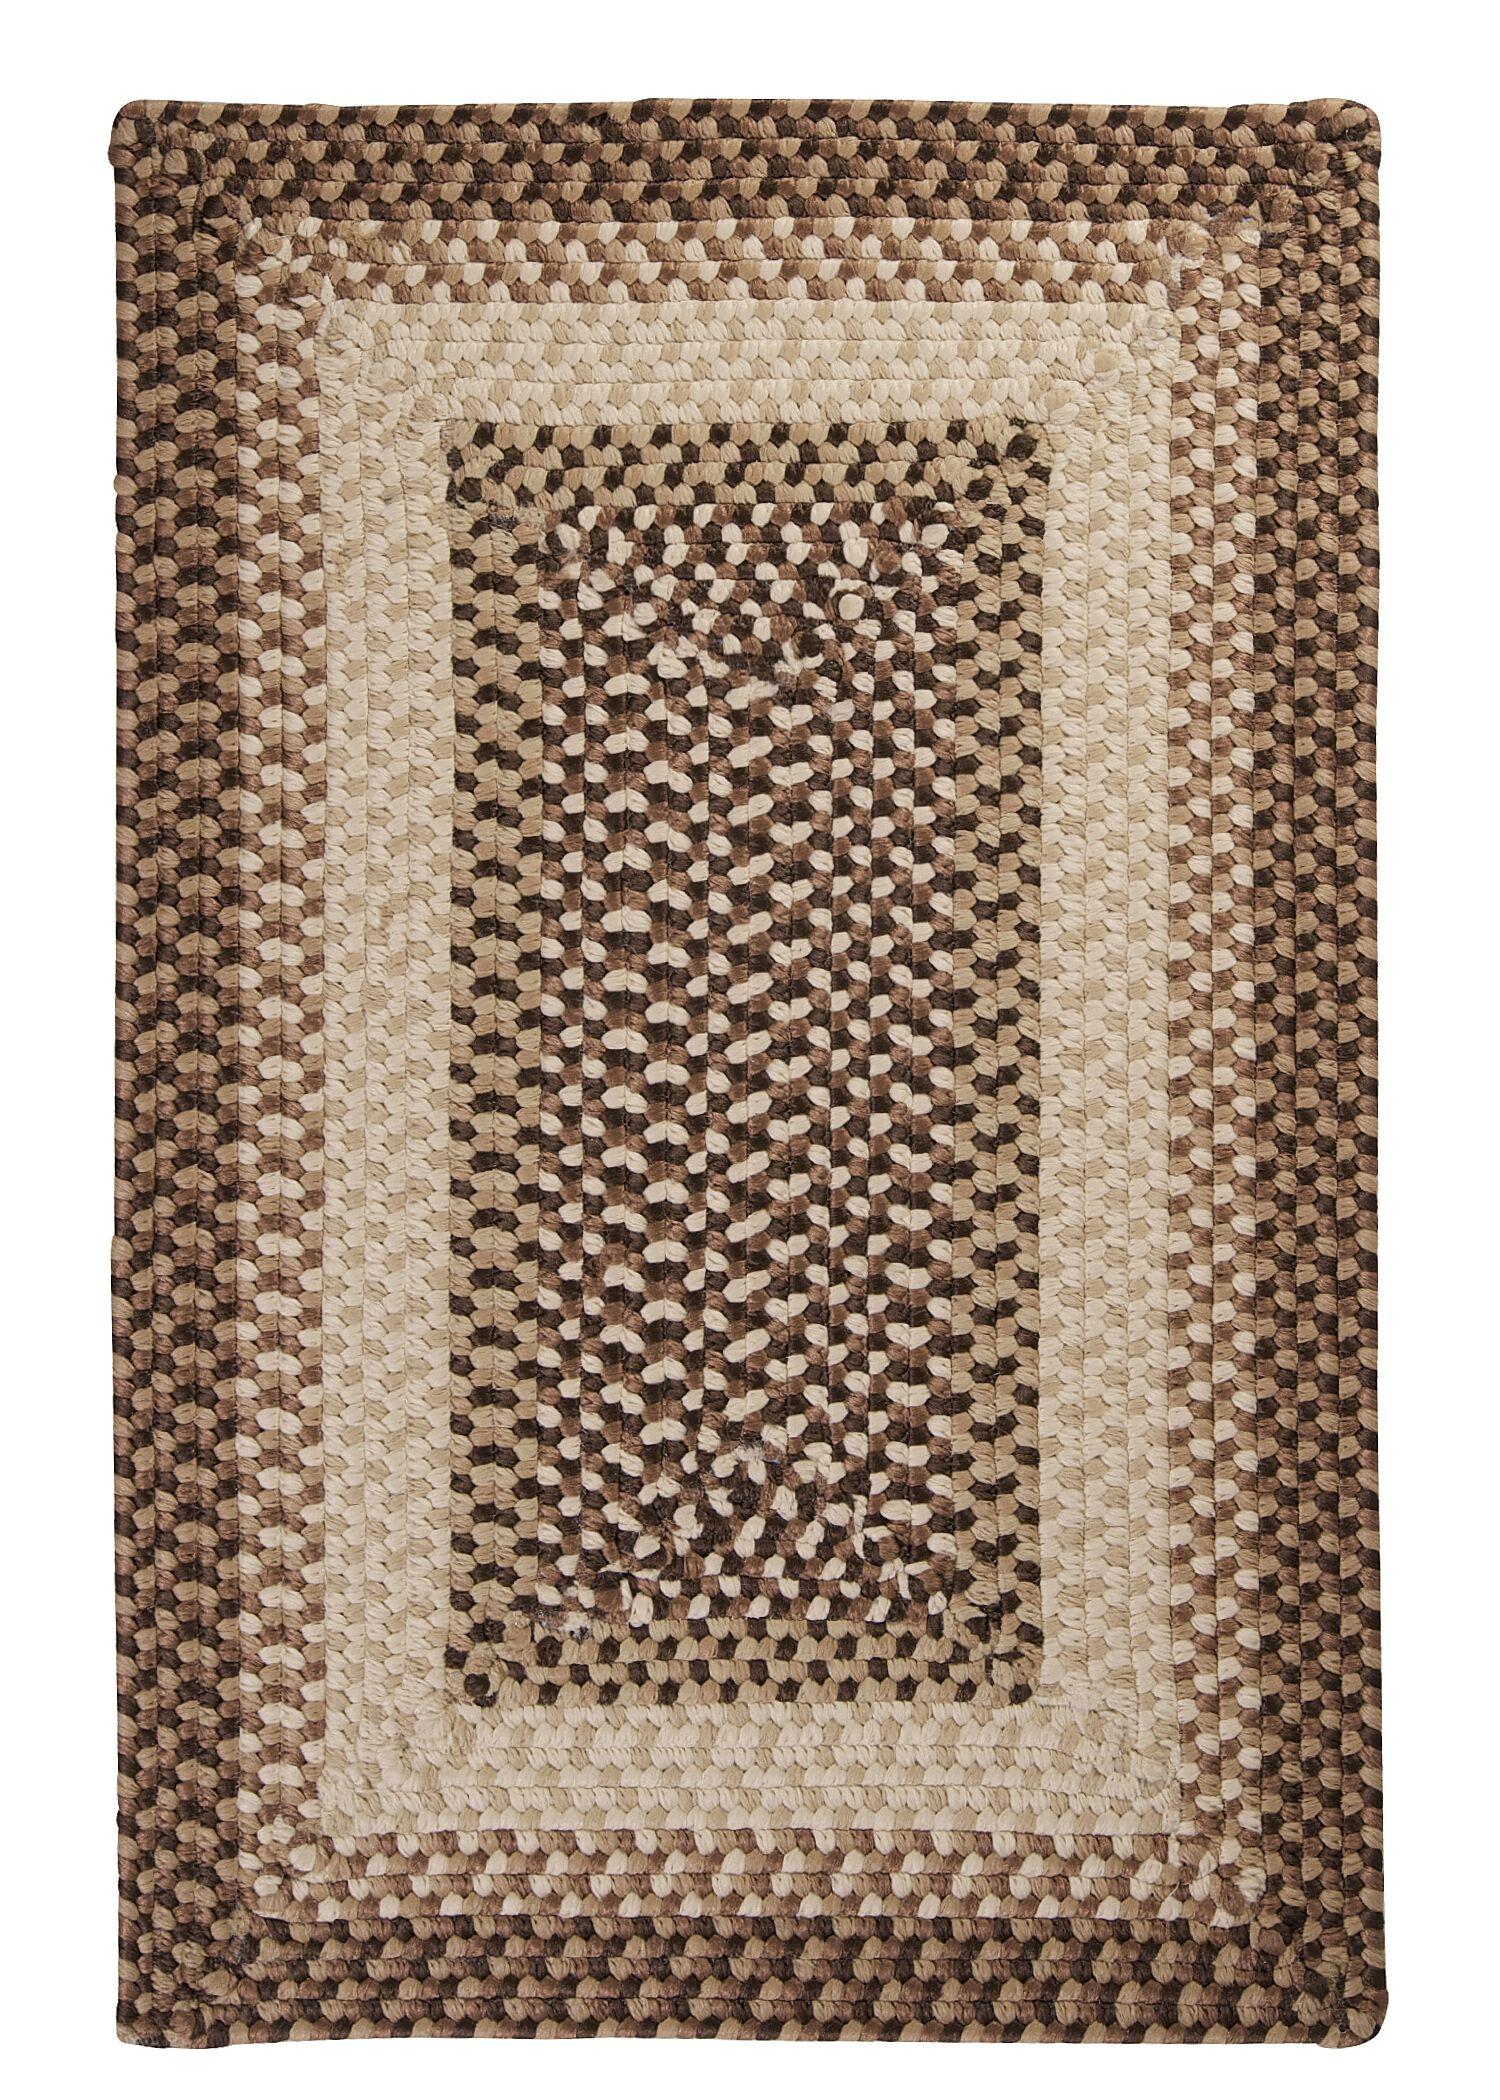 Tiburon Sandstorm Braided Indoor/Outdoor Area Rug Rug Size: Square 10'